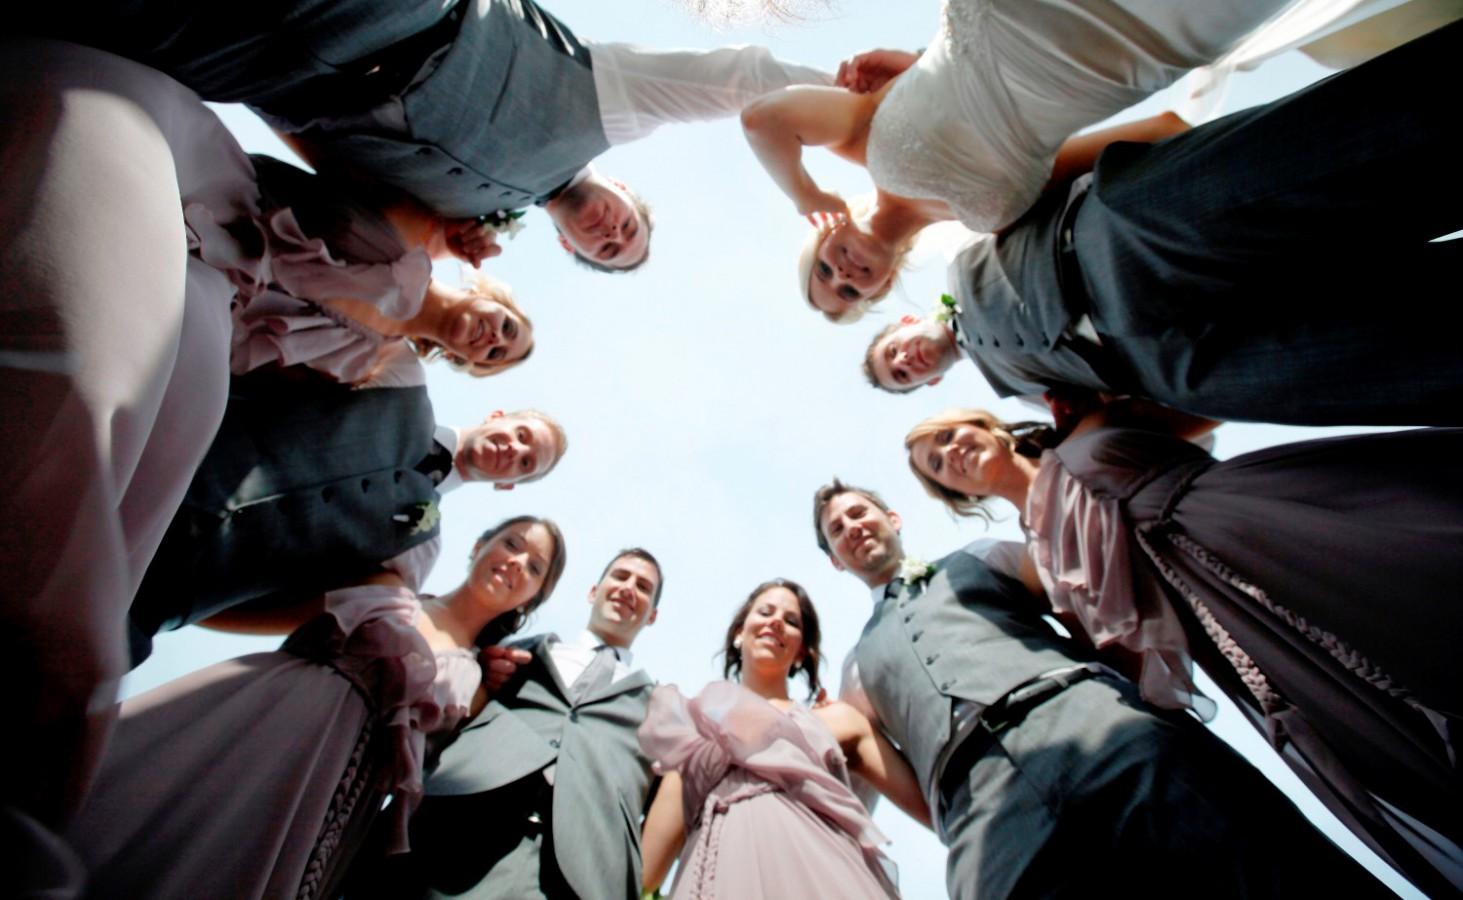 2011.10.16, Megann and Daniel, Ombak Luwung, MJY - Bali Wedding Paradise (25)